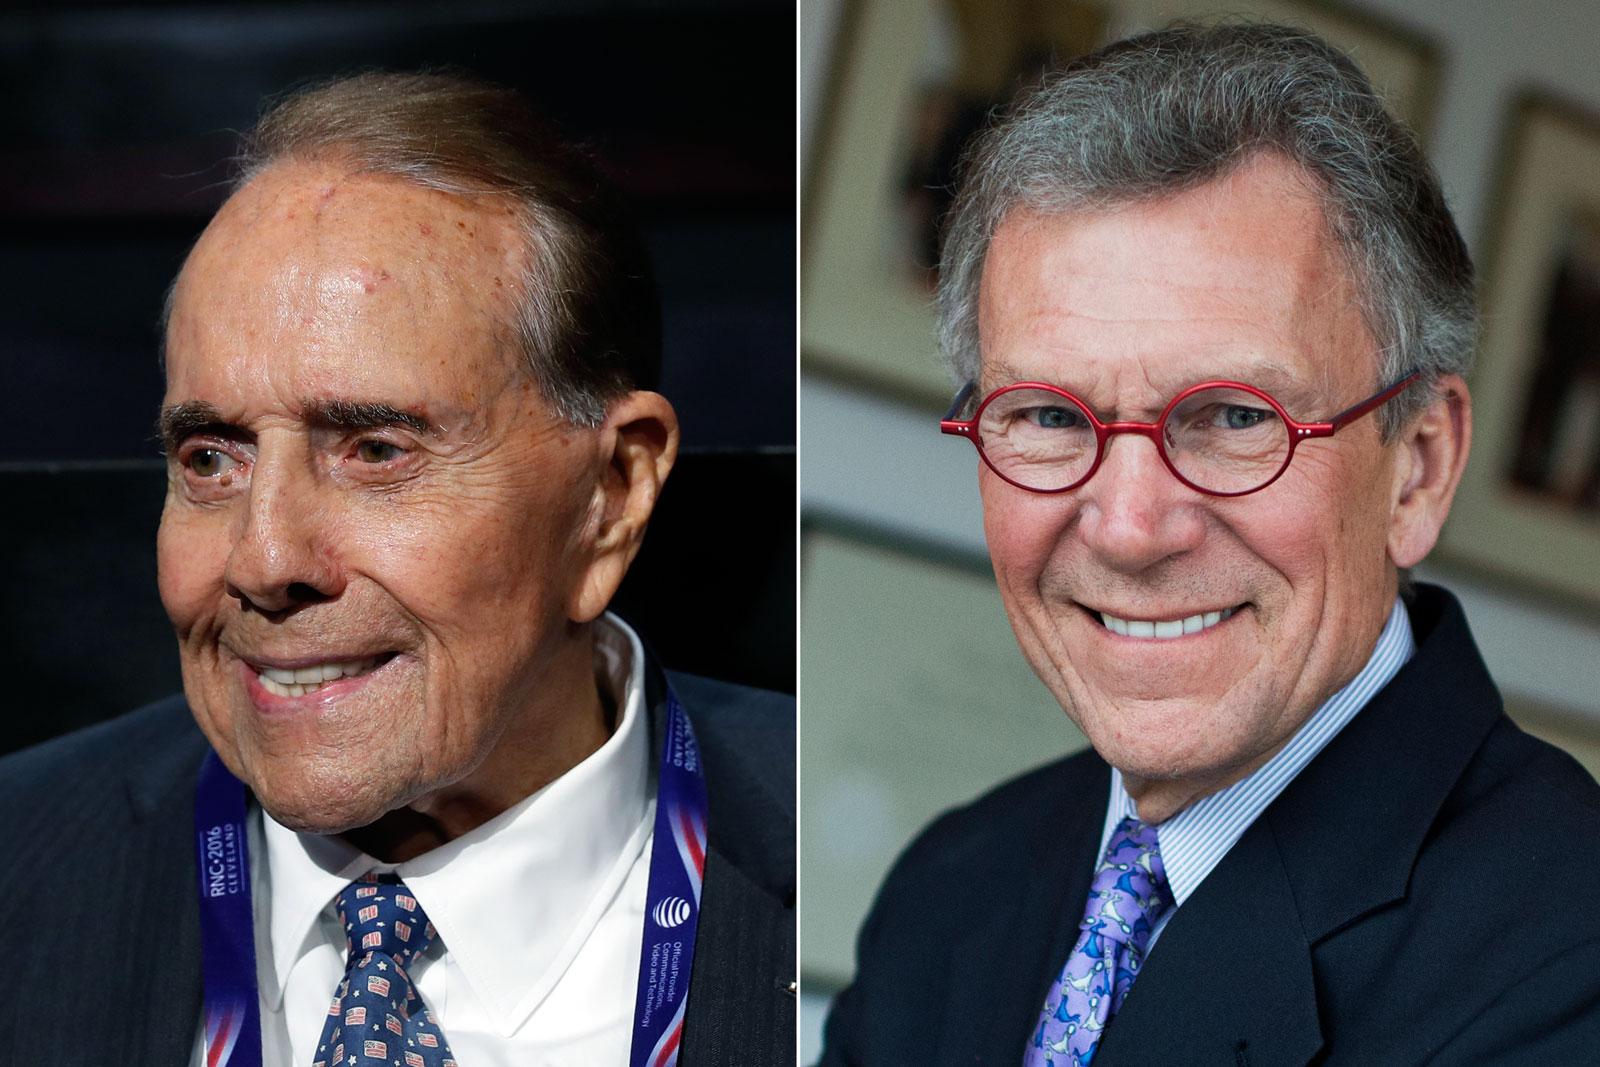 Sen. Bob Dole in Cleveland, OH, July 18, 2016 (L); Sen. Tom Daschle in his pffice in Washington, DC, on Nov. 17, 2014.